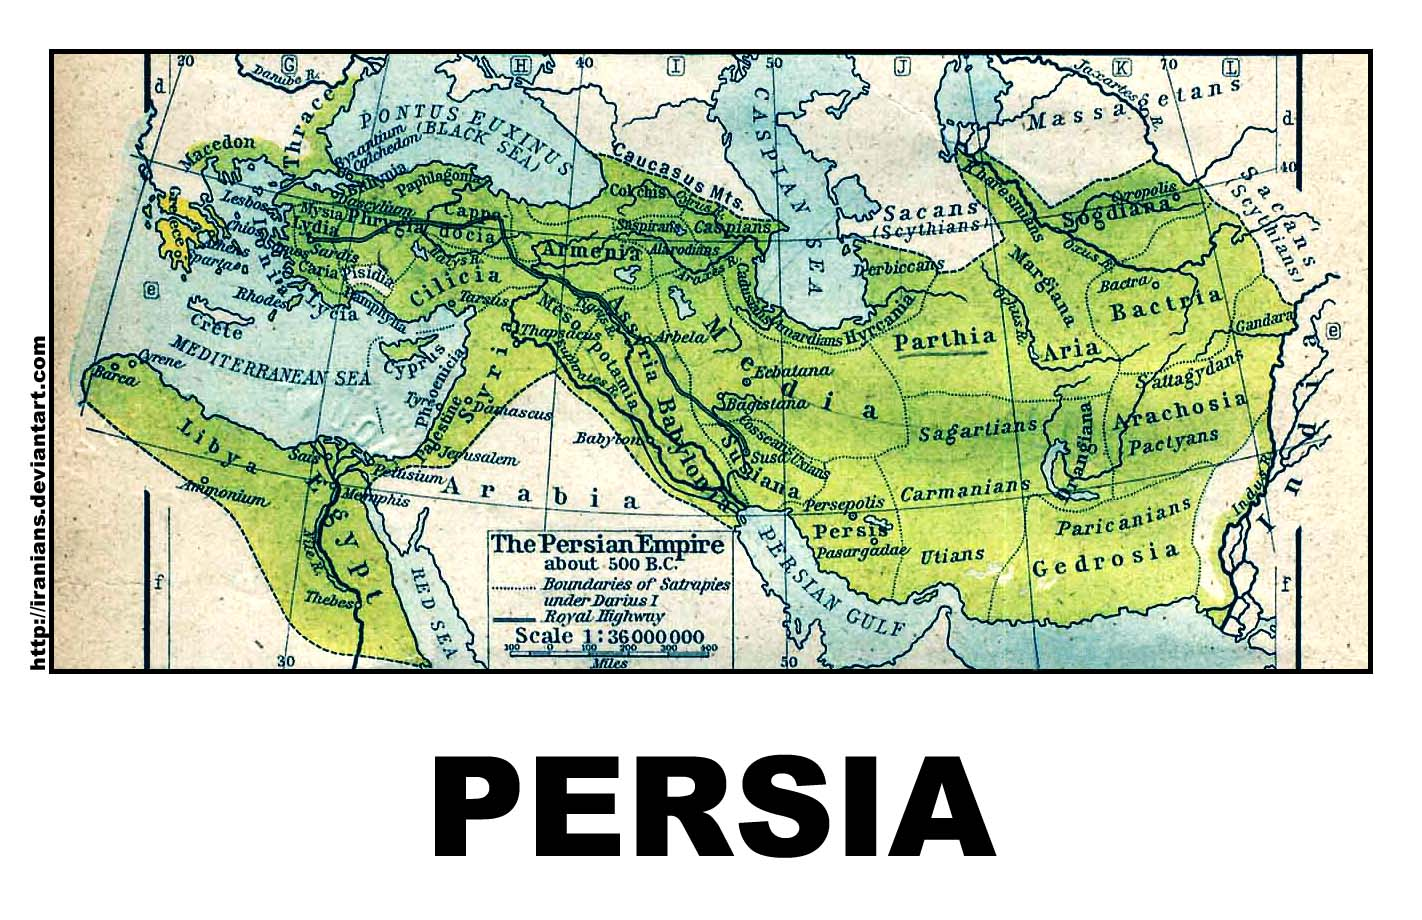 Persian Empire - 500 B.C by iranians